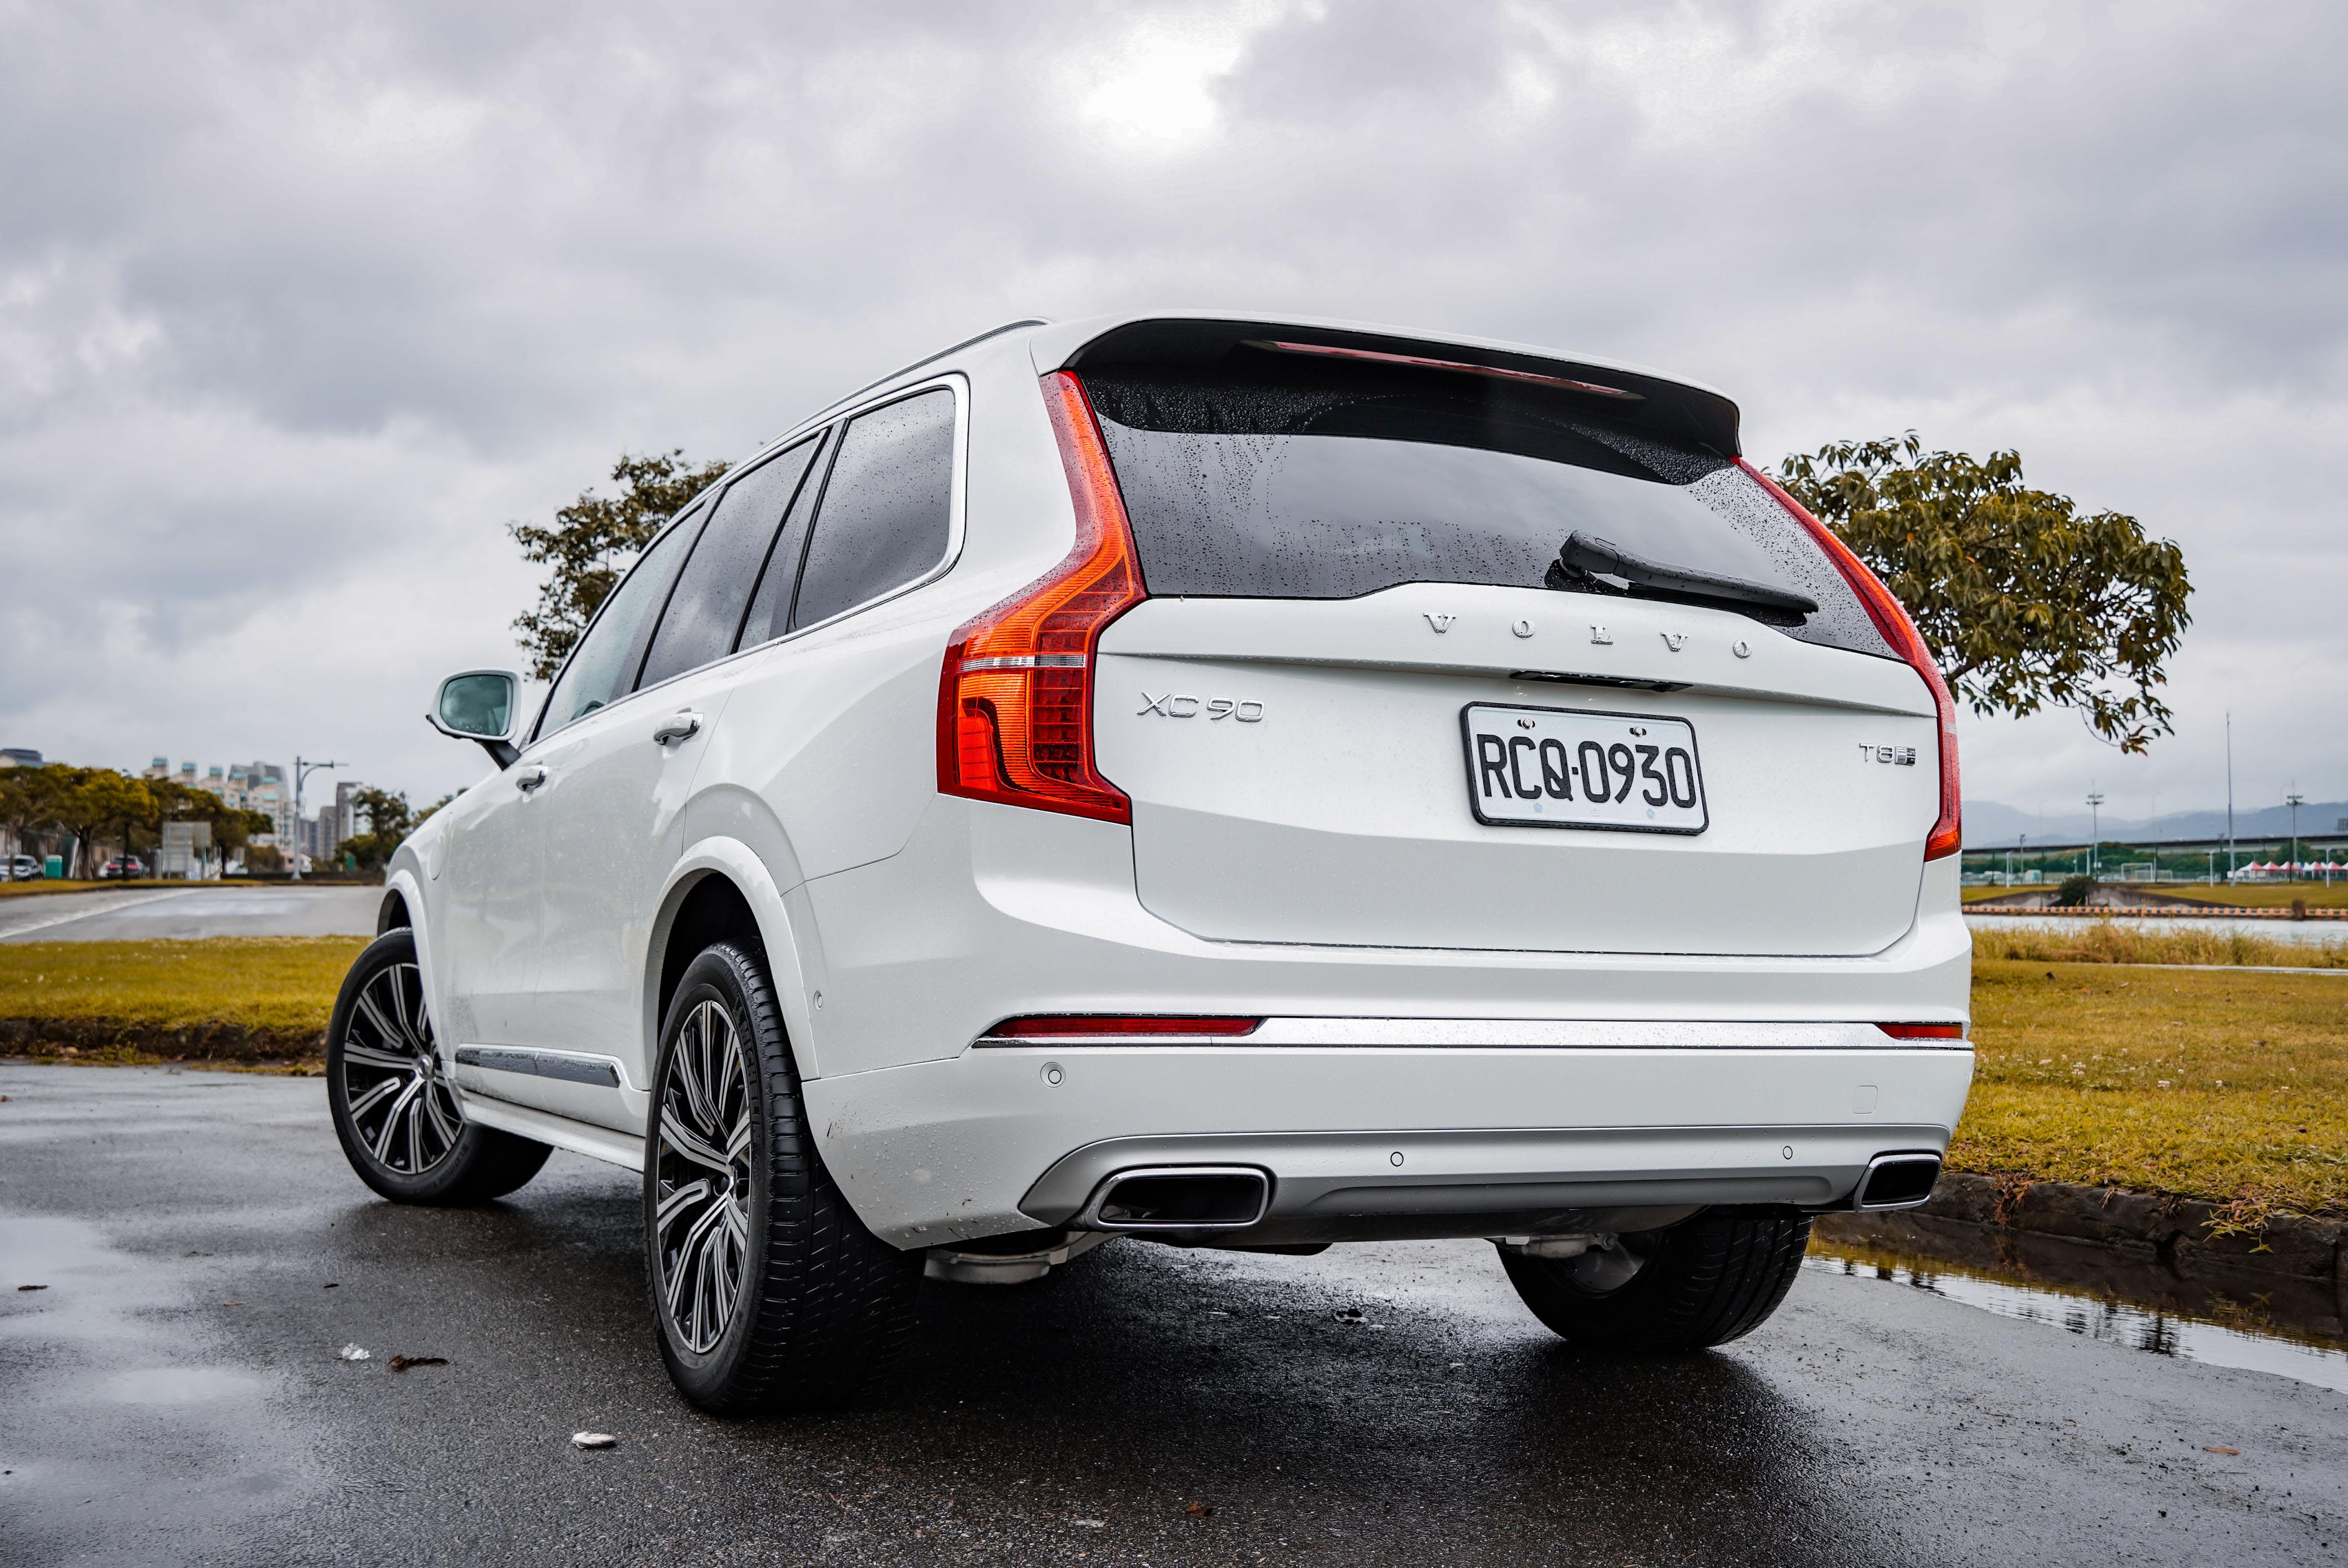 T8 動力另提供 420 萬元的 Excellence 四人座車型。